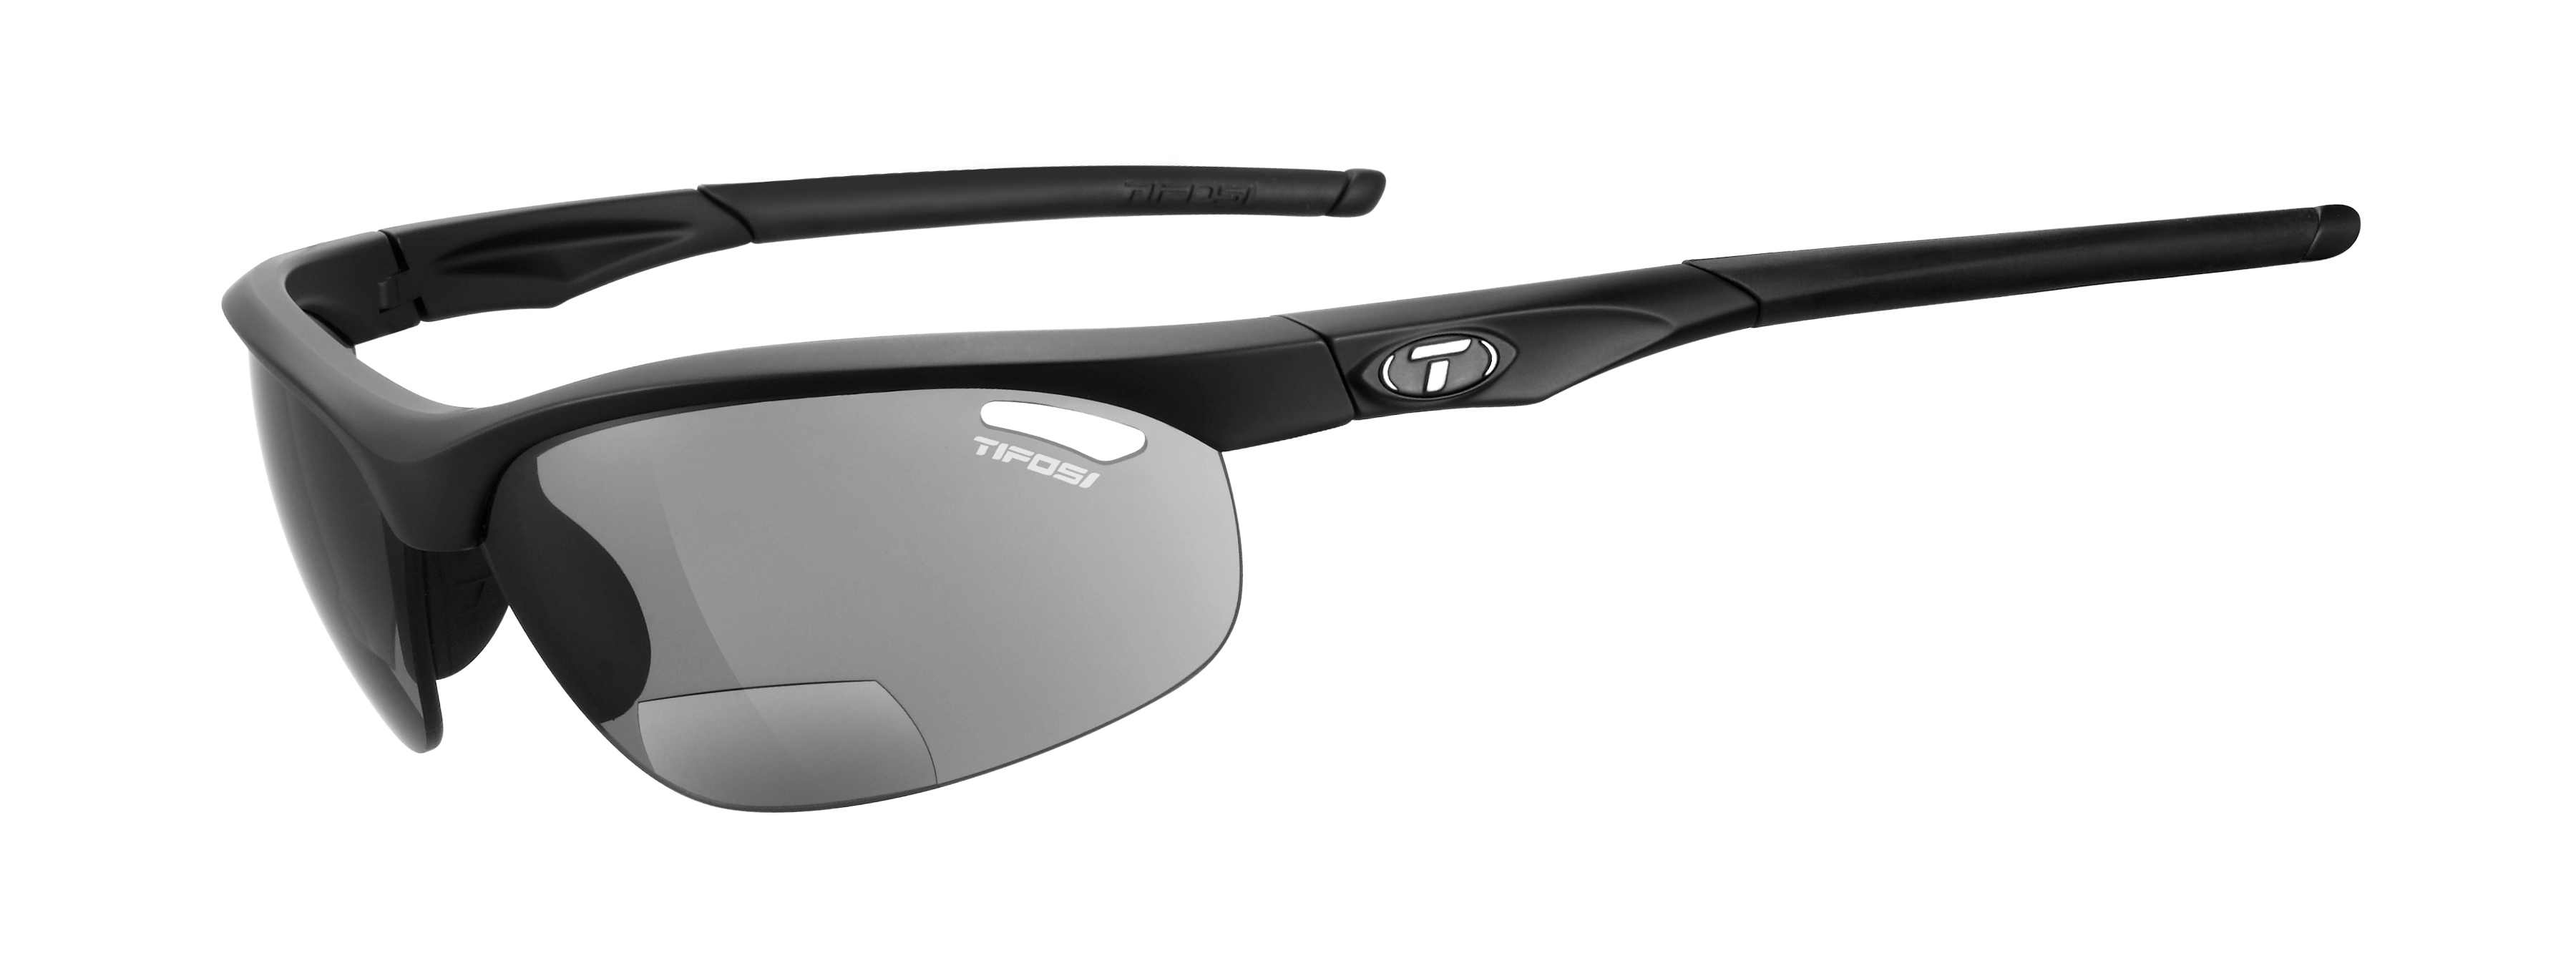 Tifosi cykelbrille Veloce mat sort Smoke Reader +2.5 | Glasses